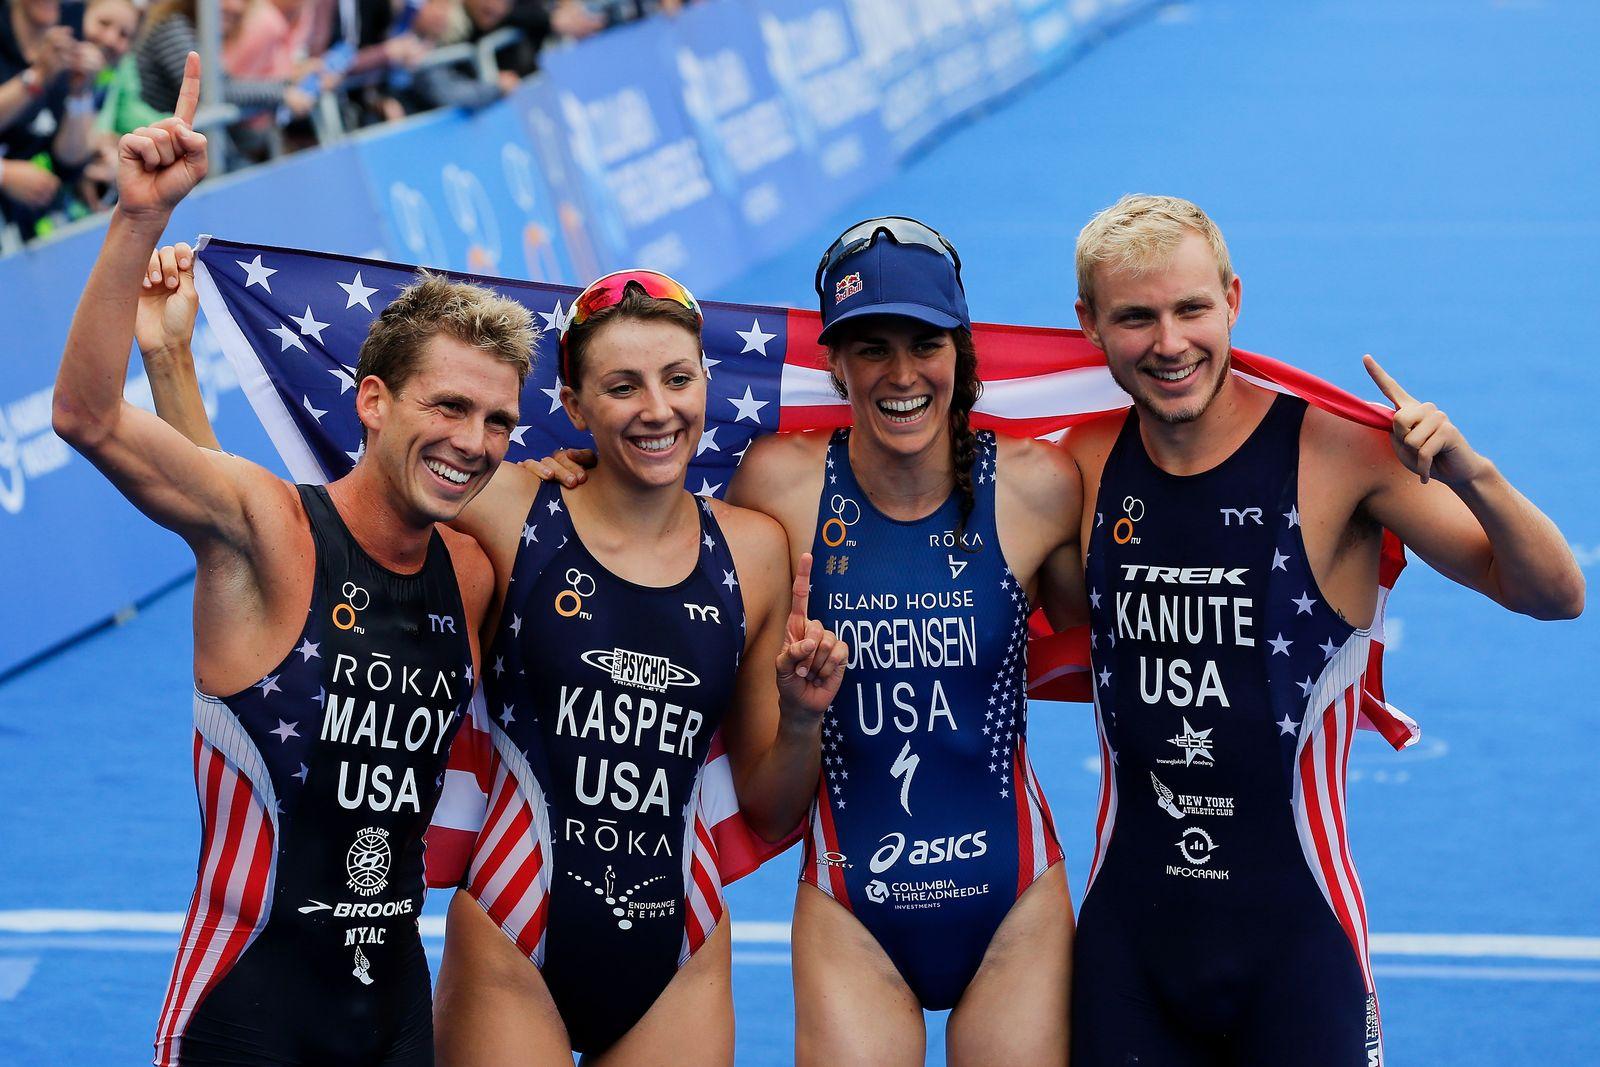 Mixed Team Triathlon